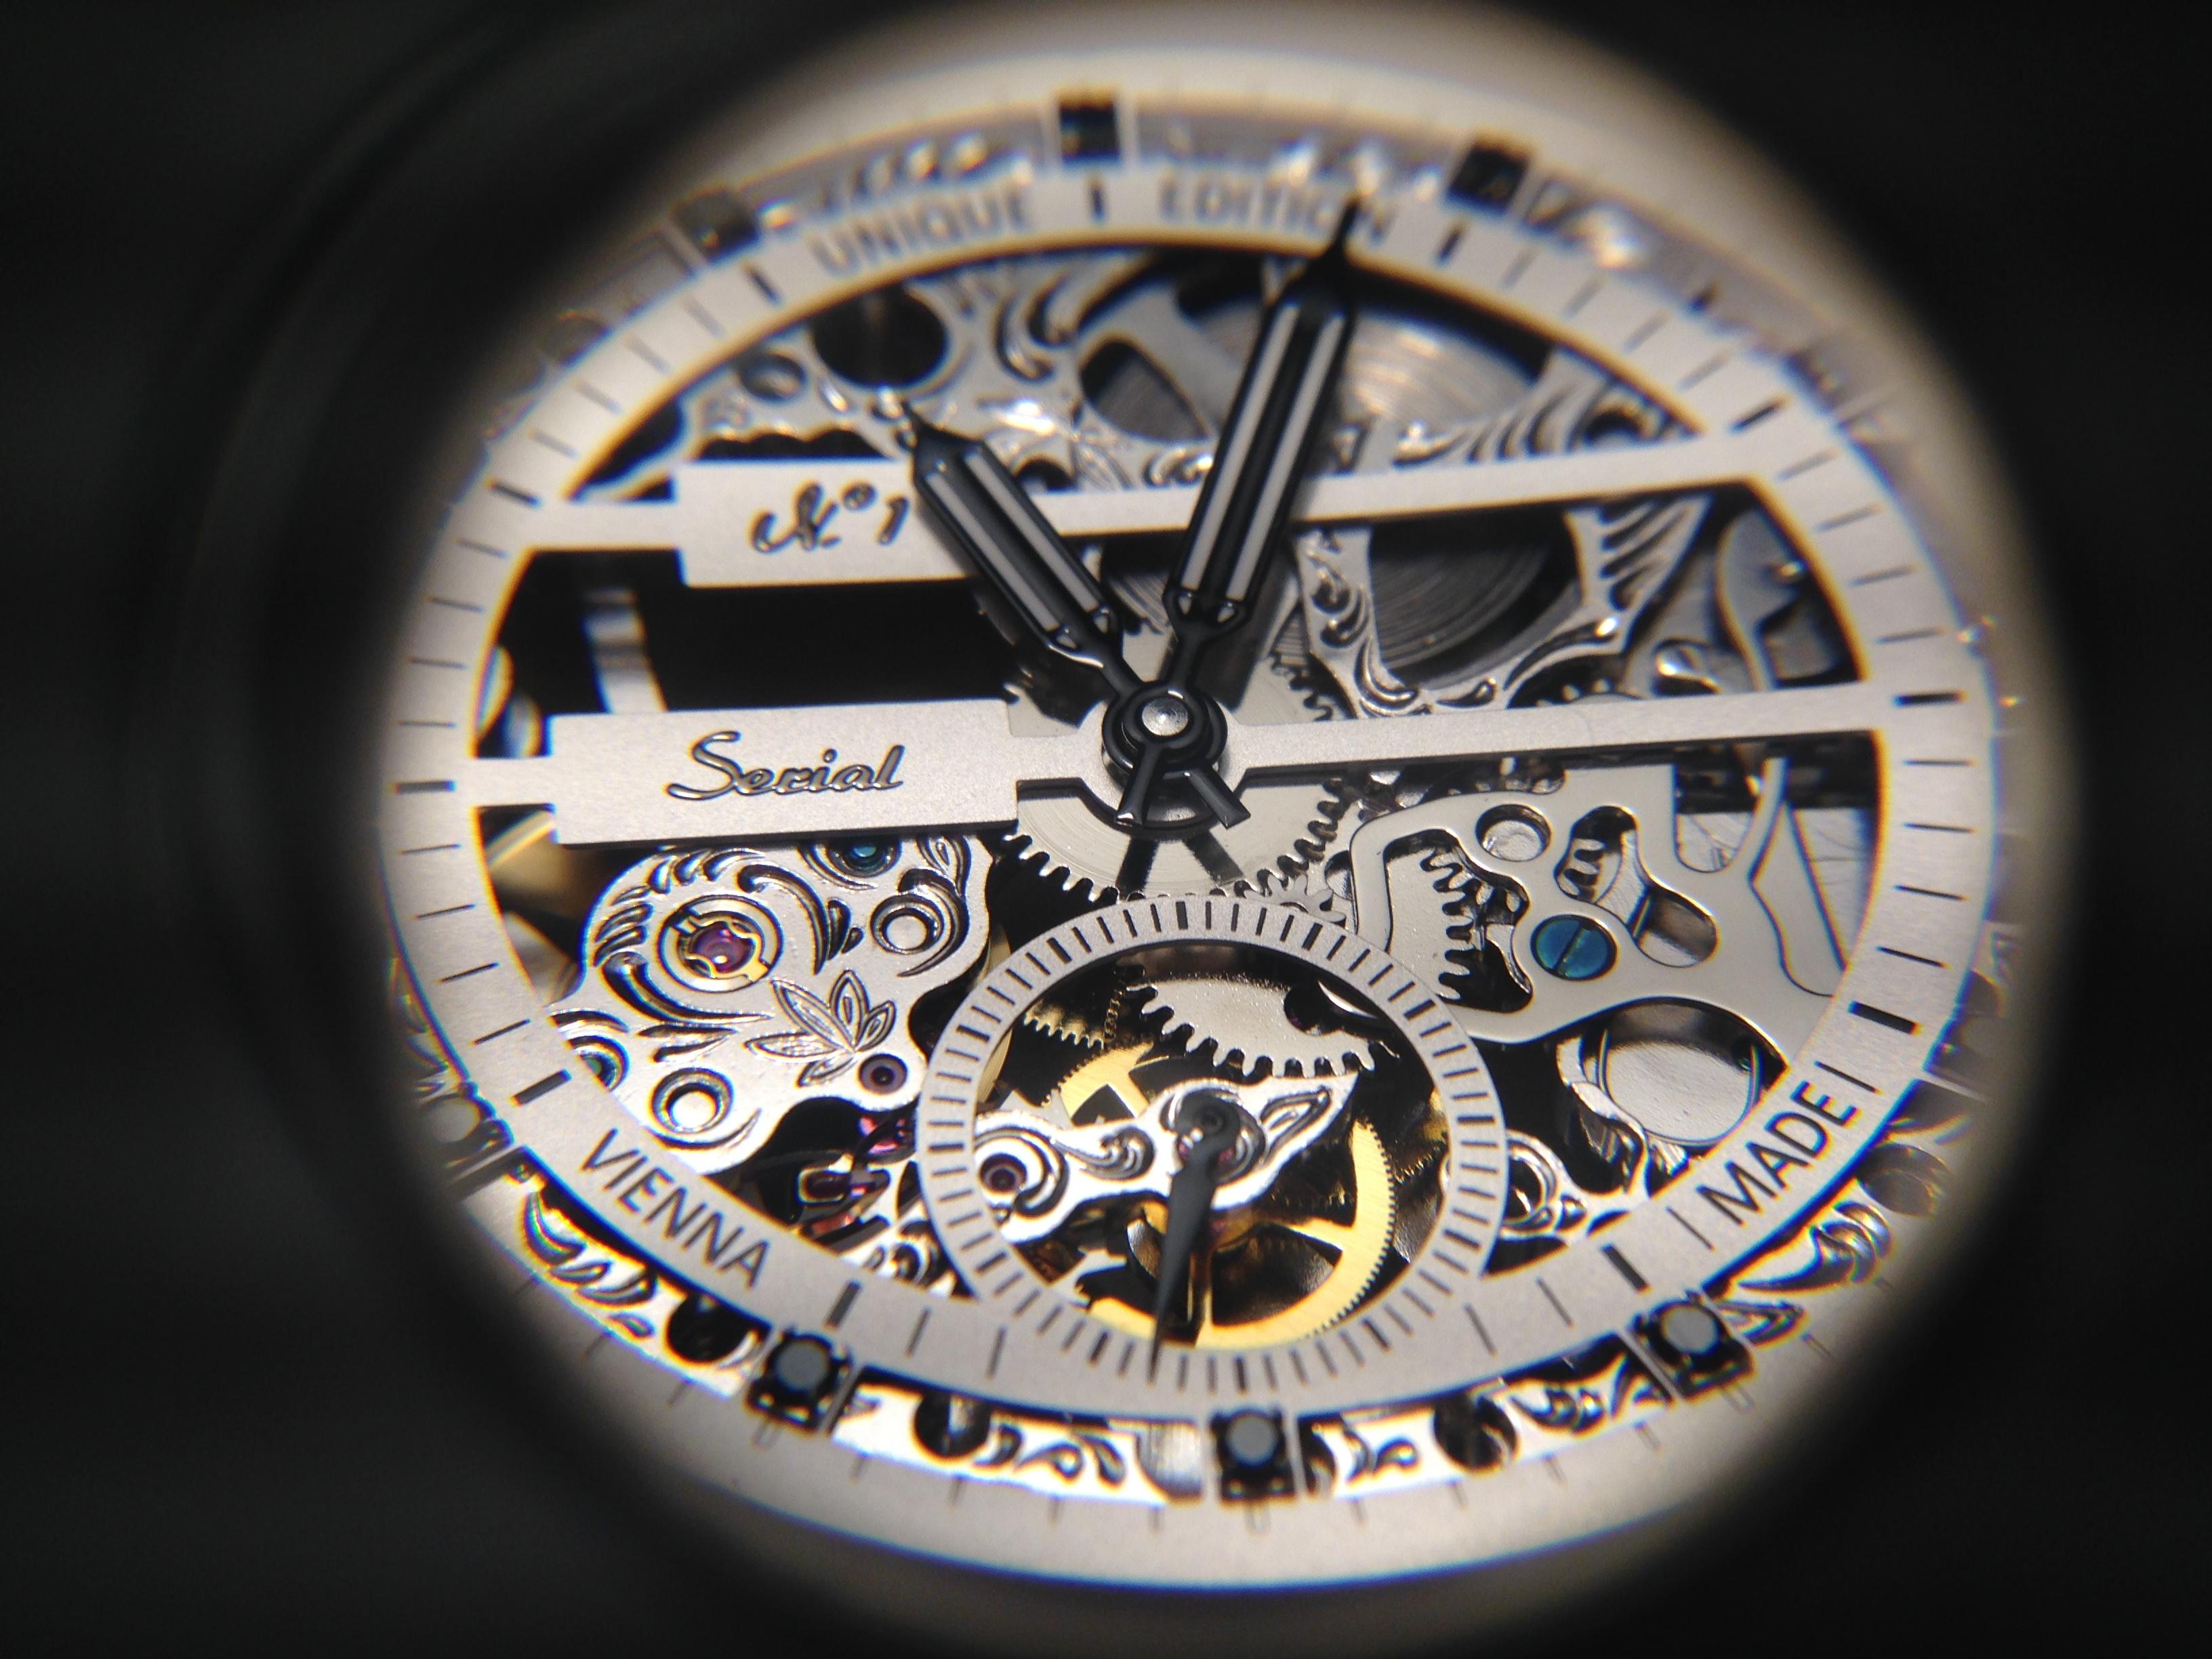 sn1timewatch